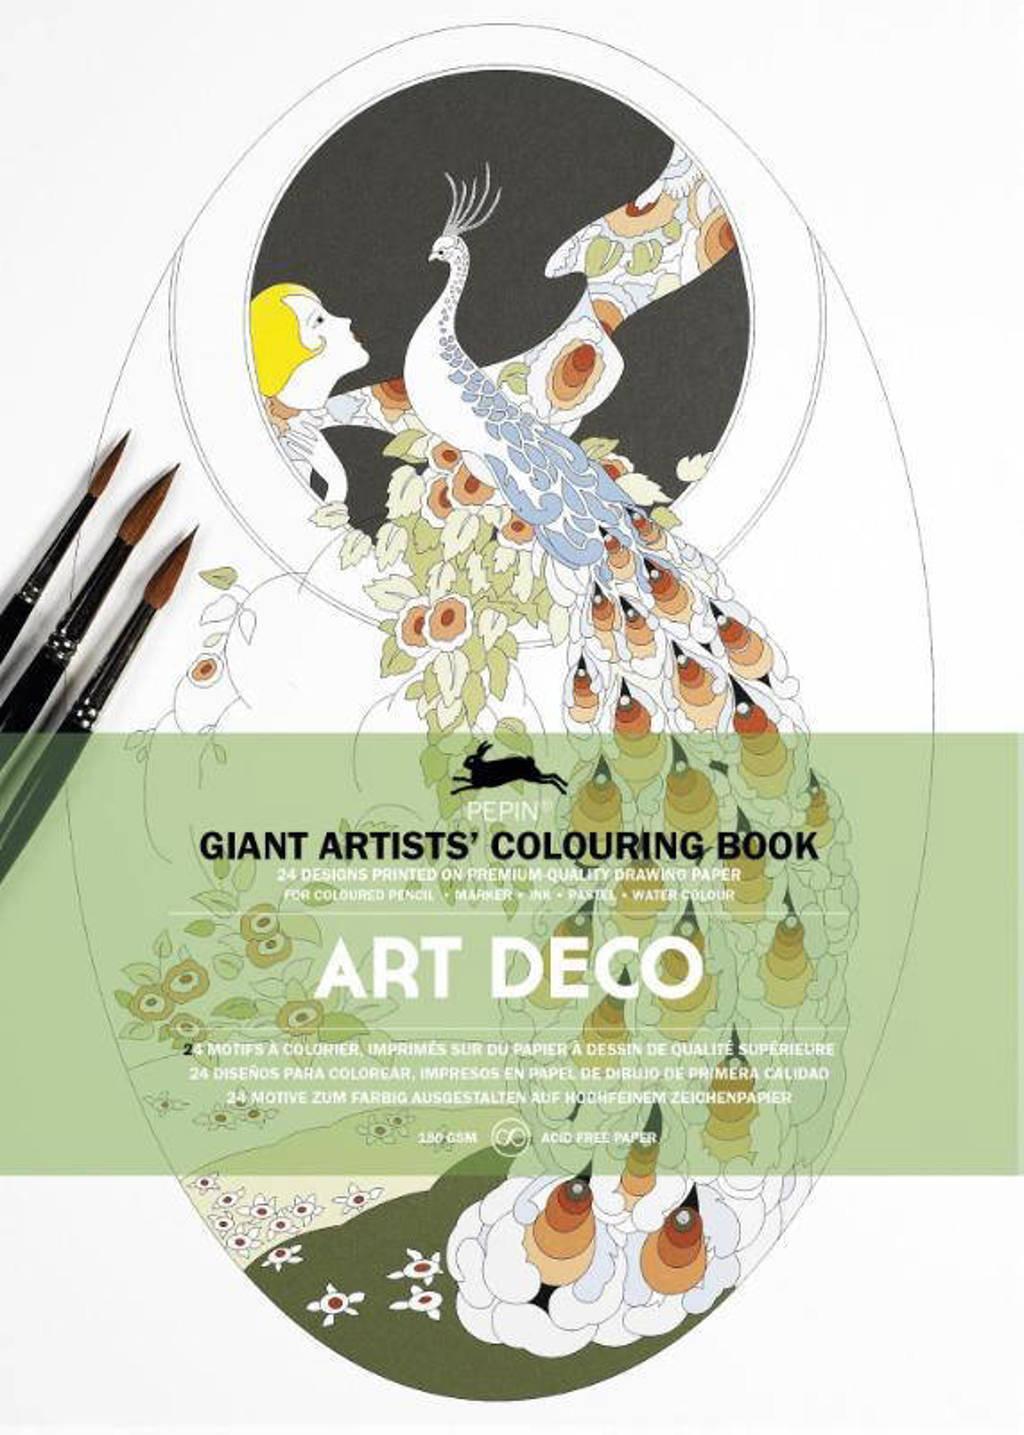 Artists' colouring book: Art Deco - Pepin van Roojen